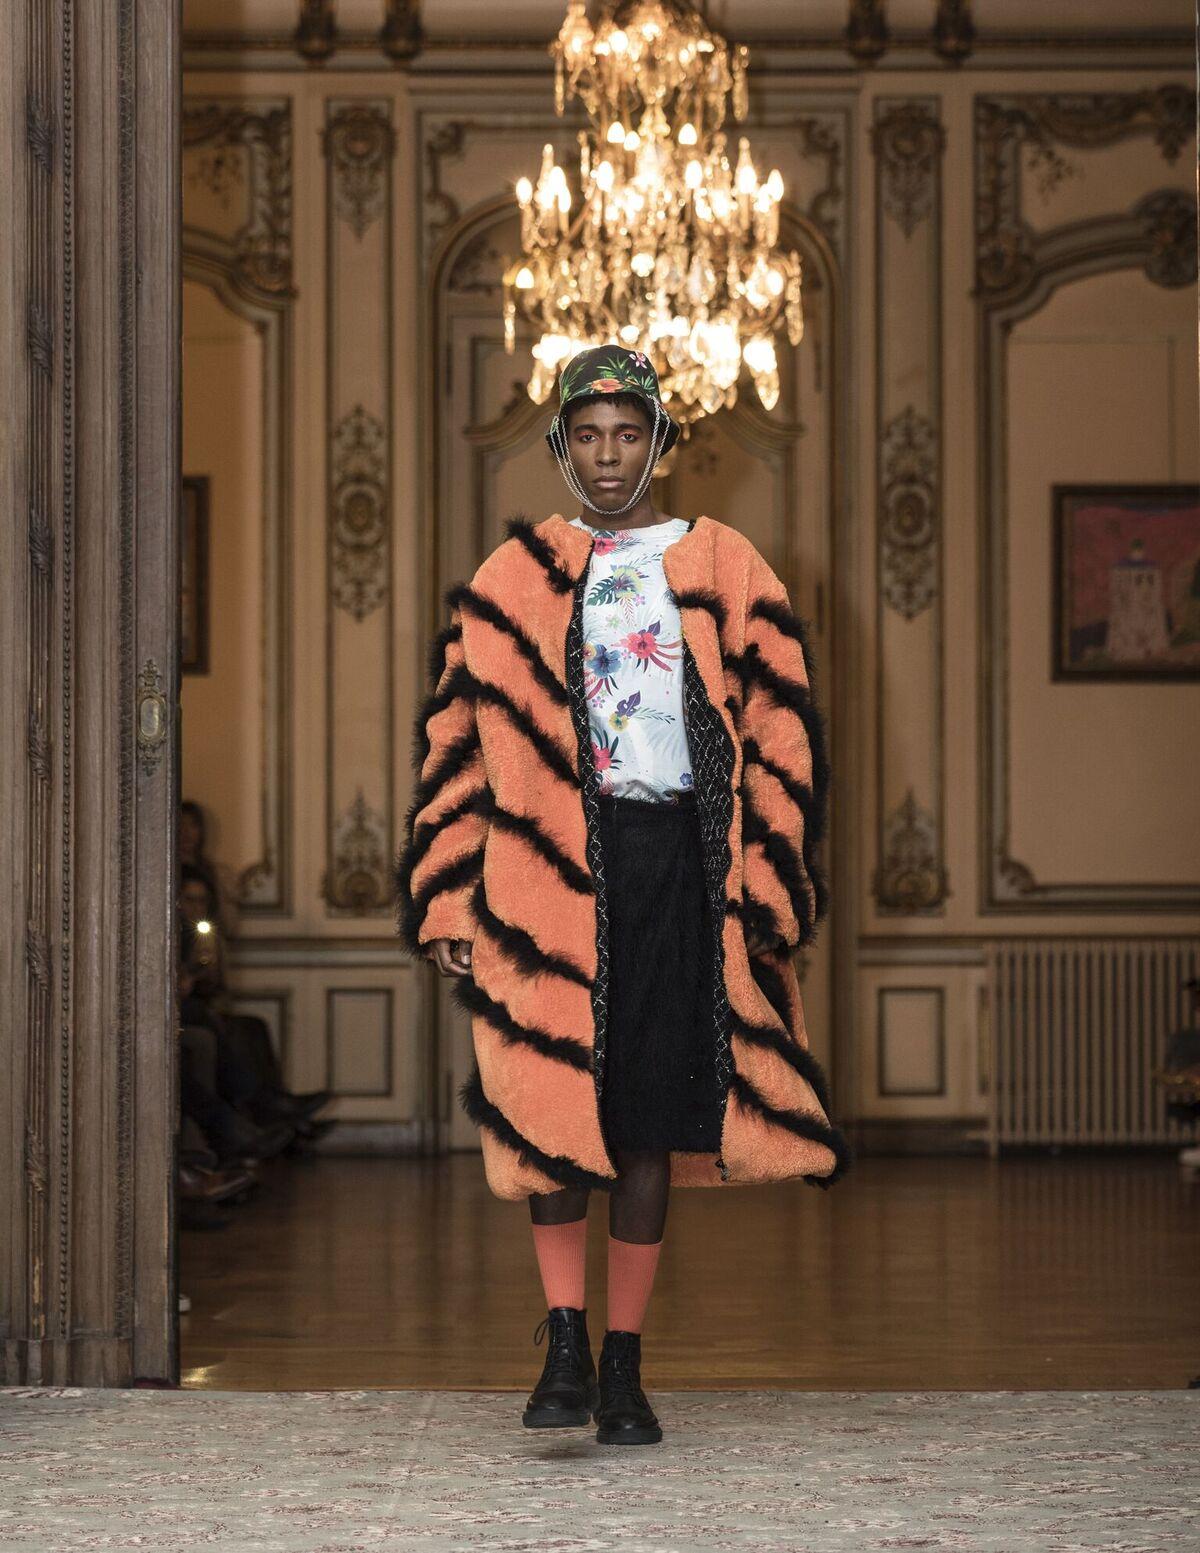 Shaleva freedom ss20 during paris fashion week (5)